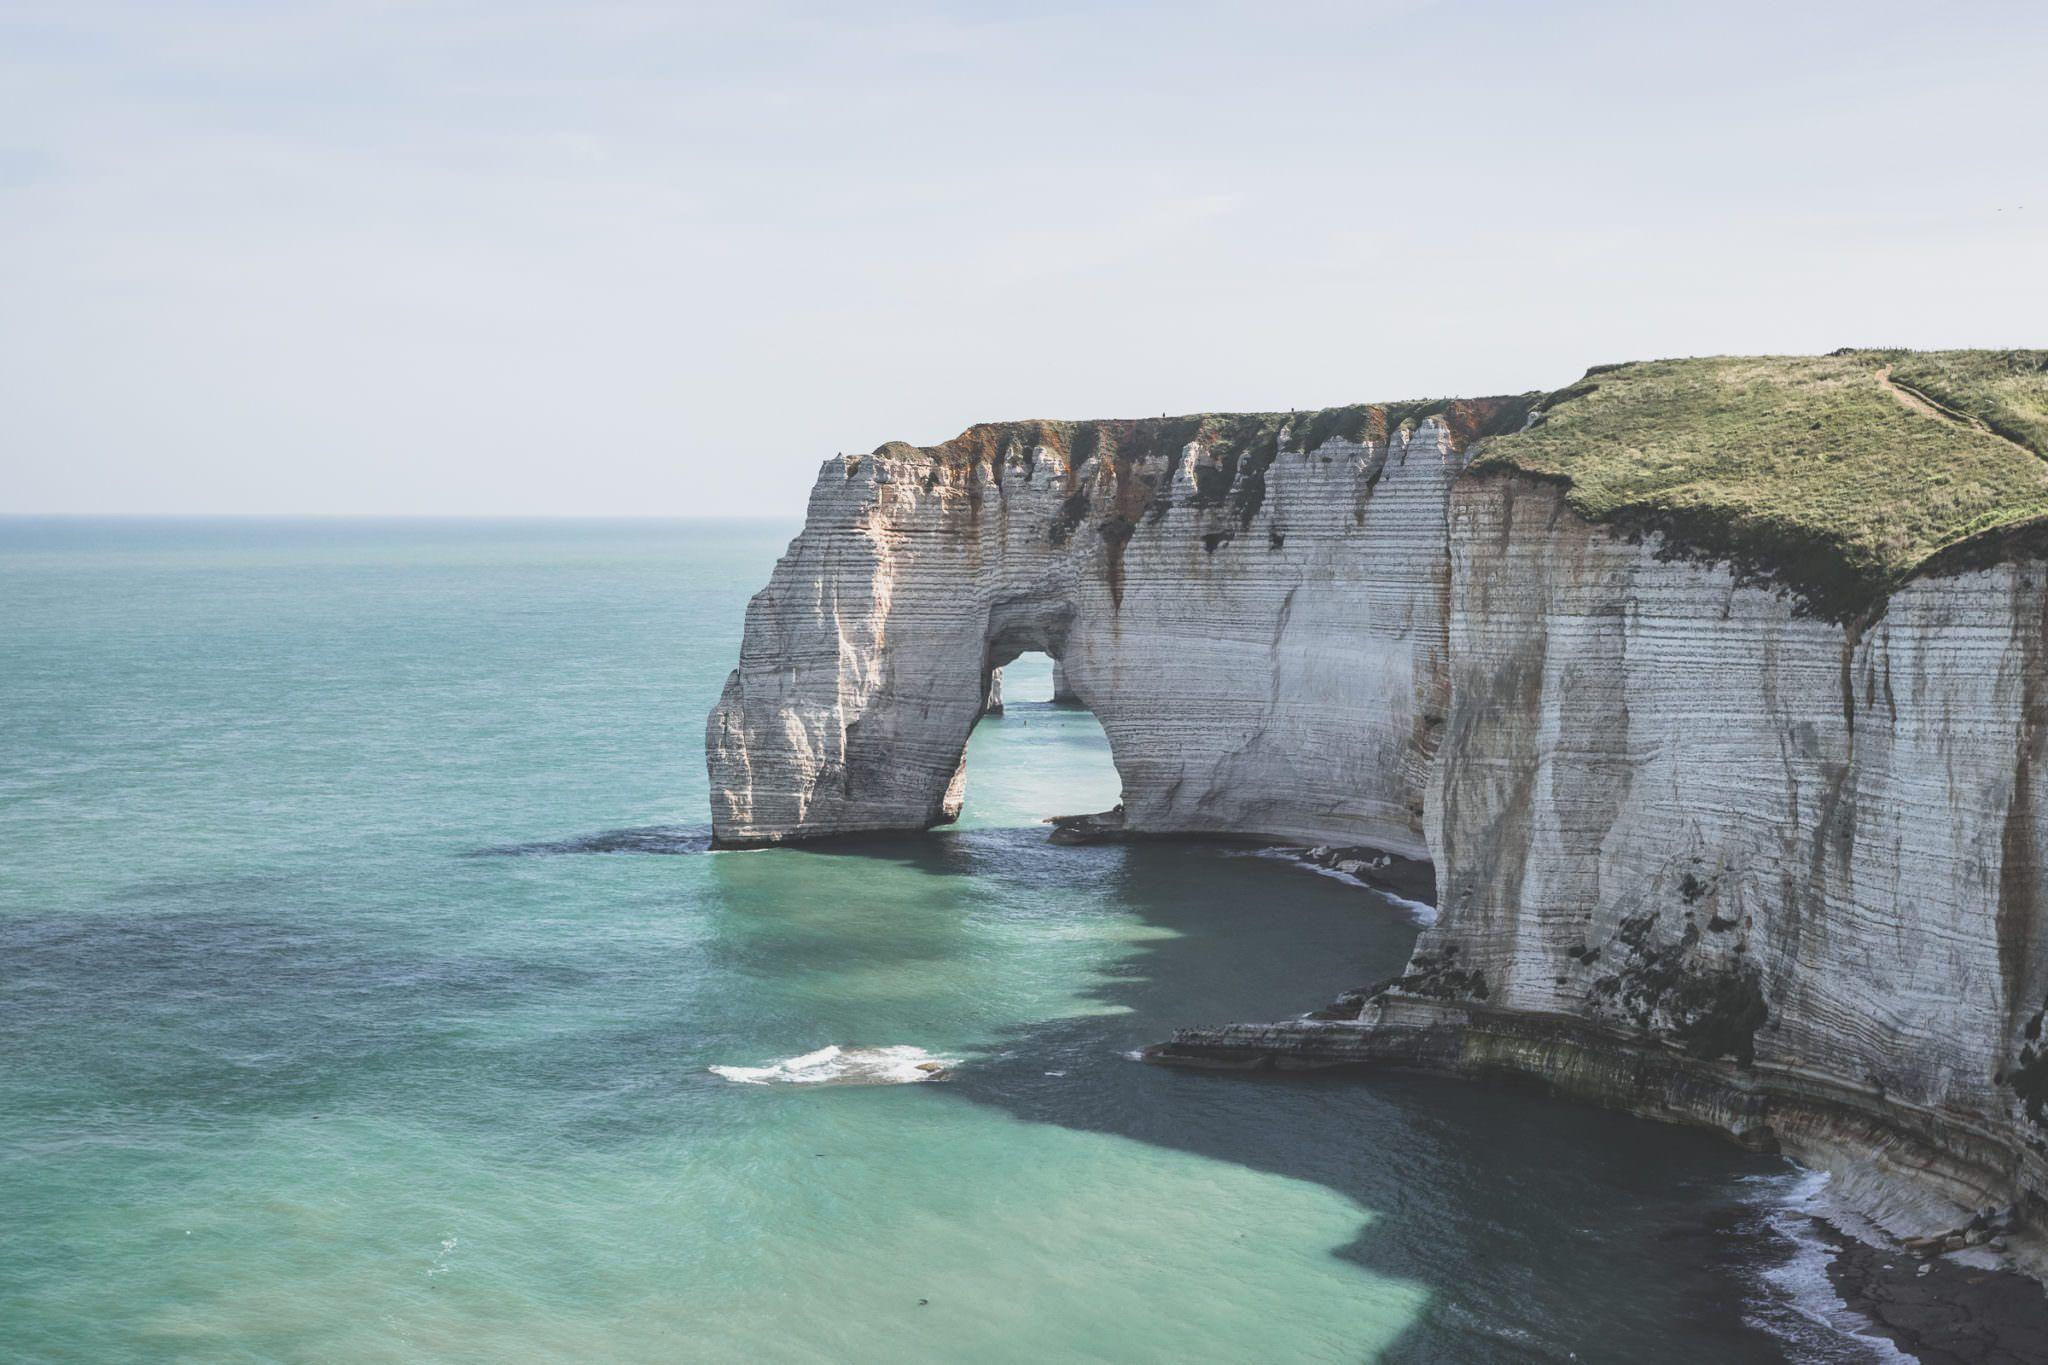 France seine maritime etretat